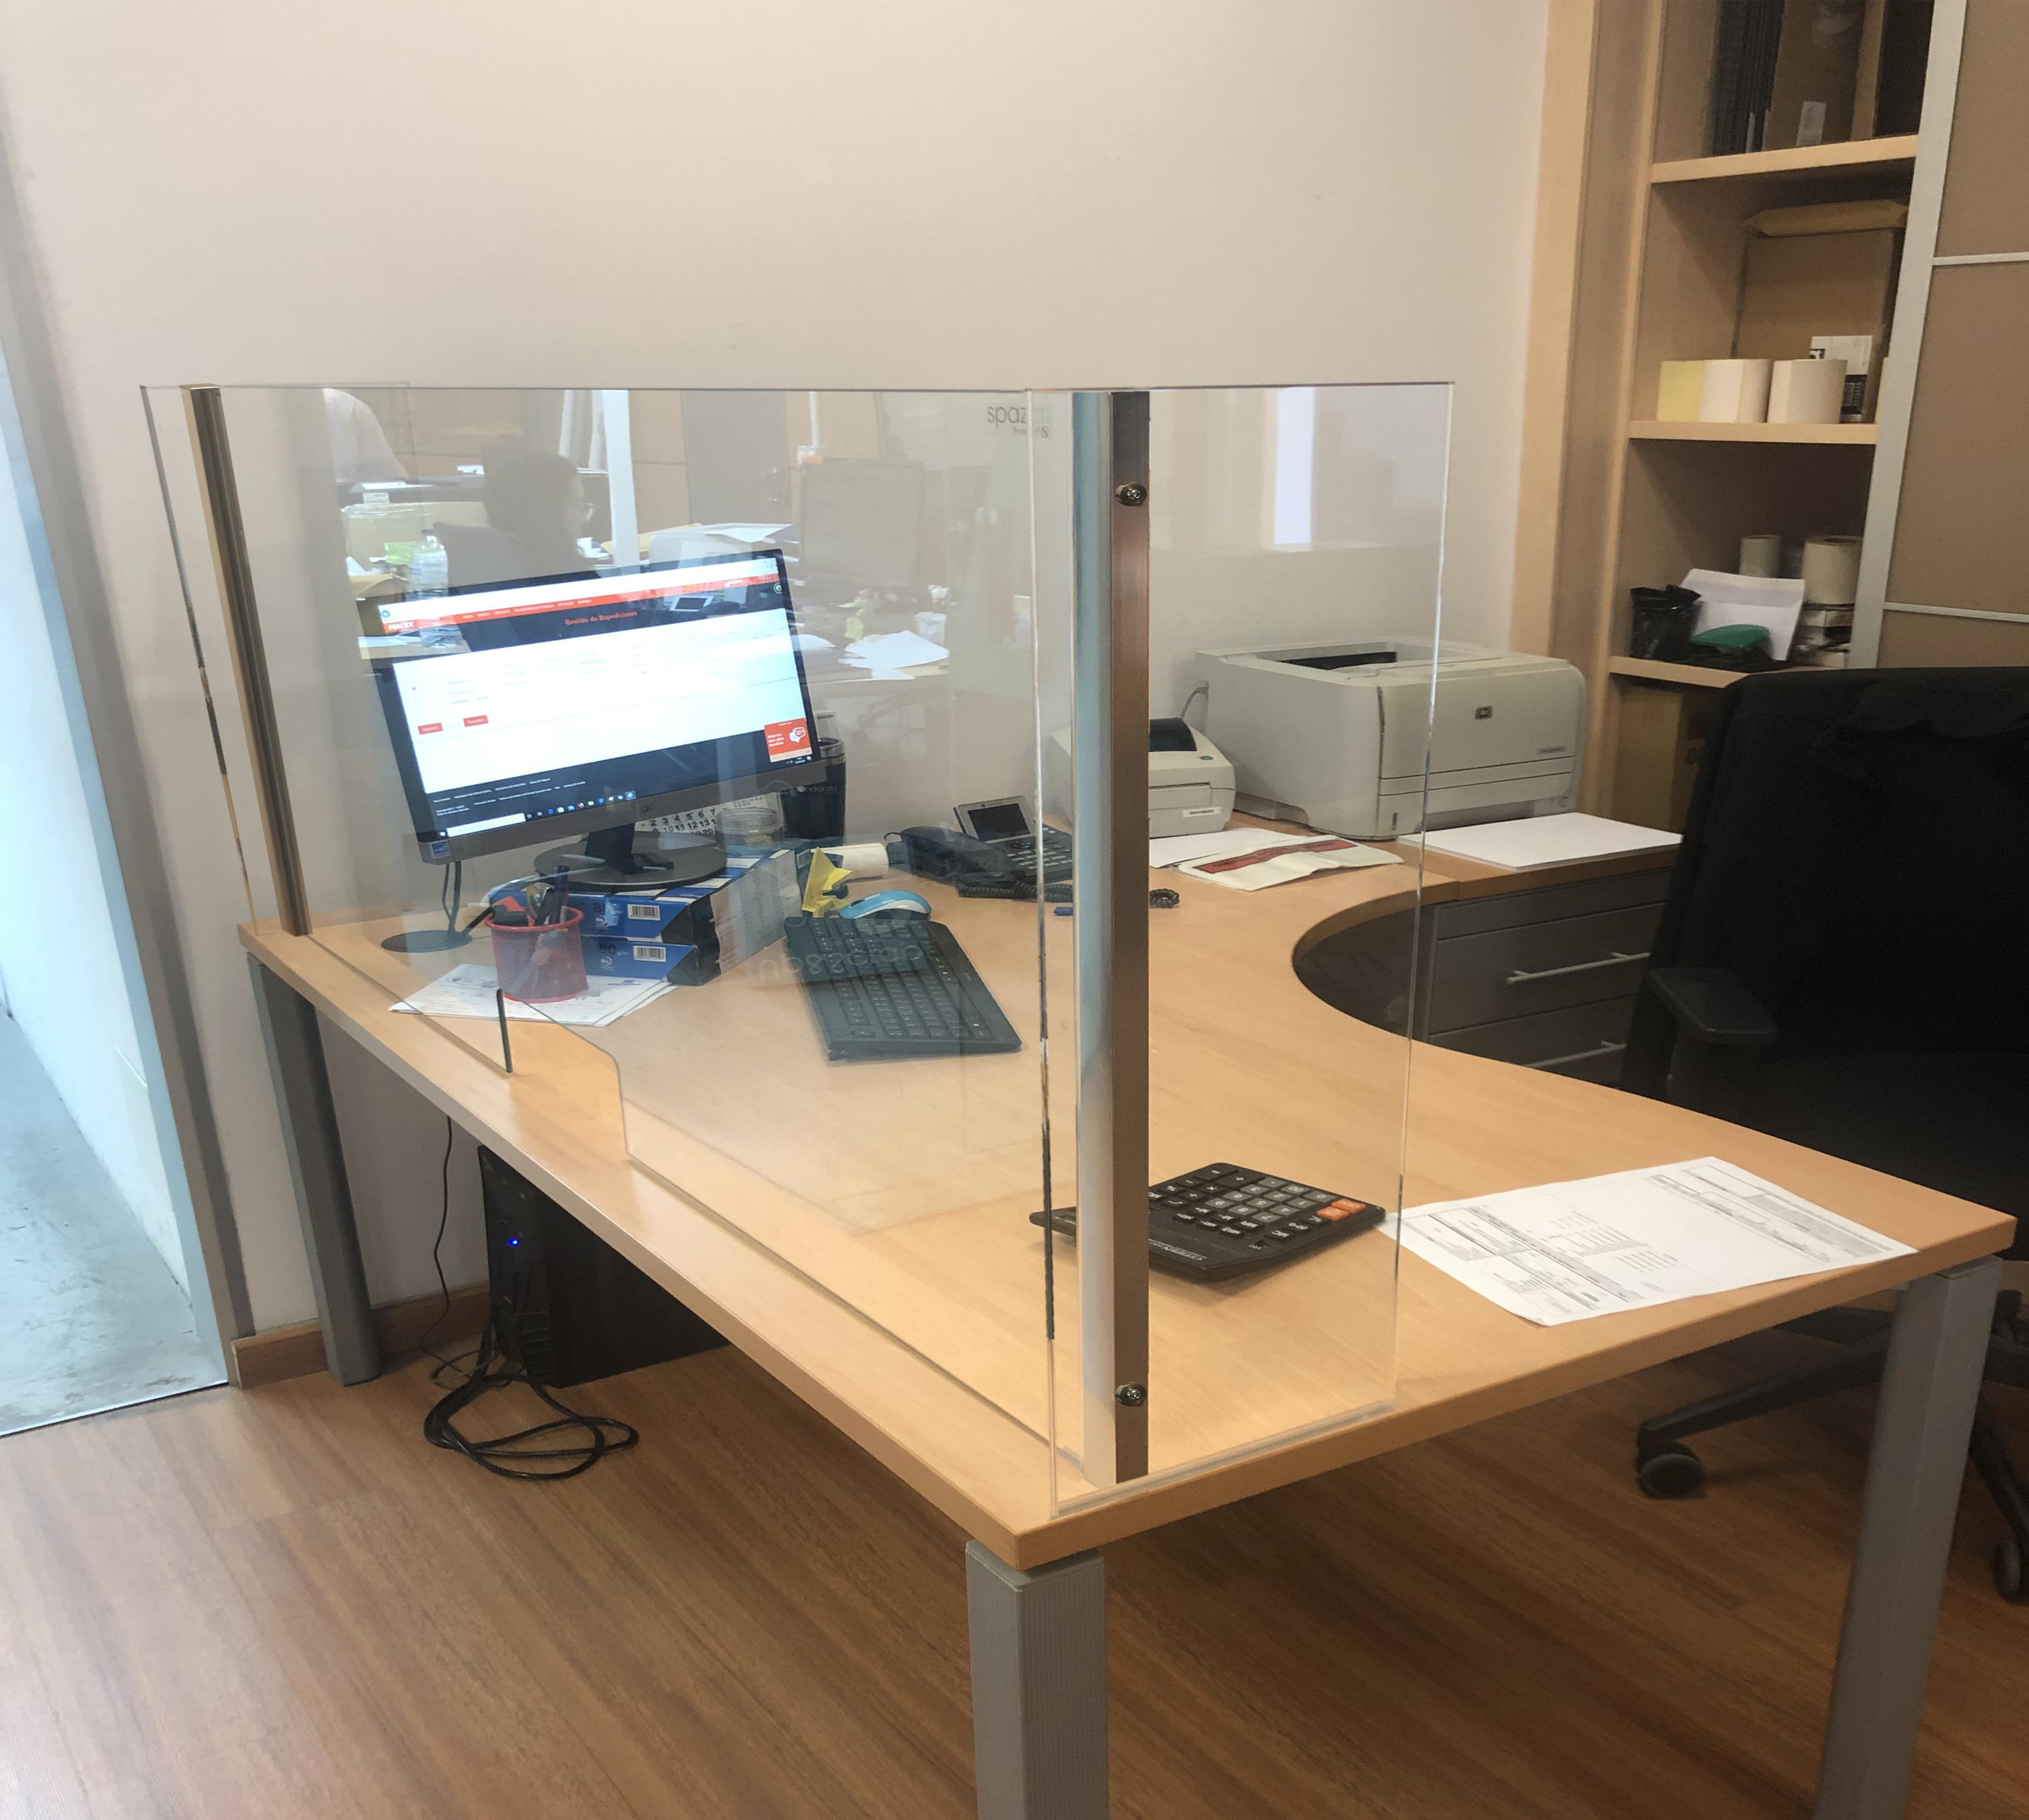 oficina proteck S - Proteck P